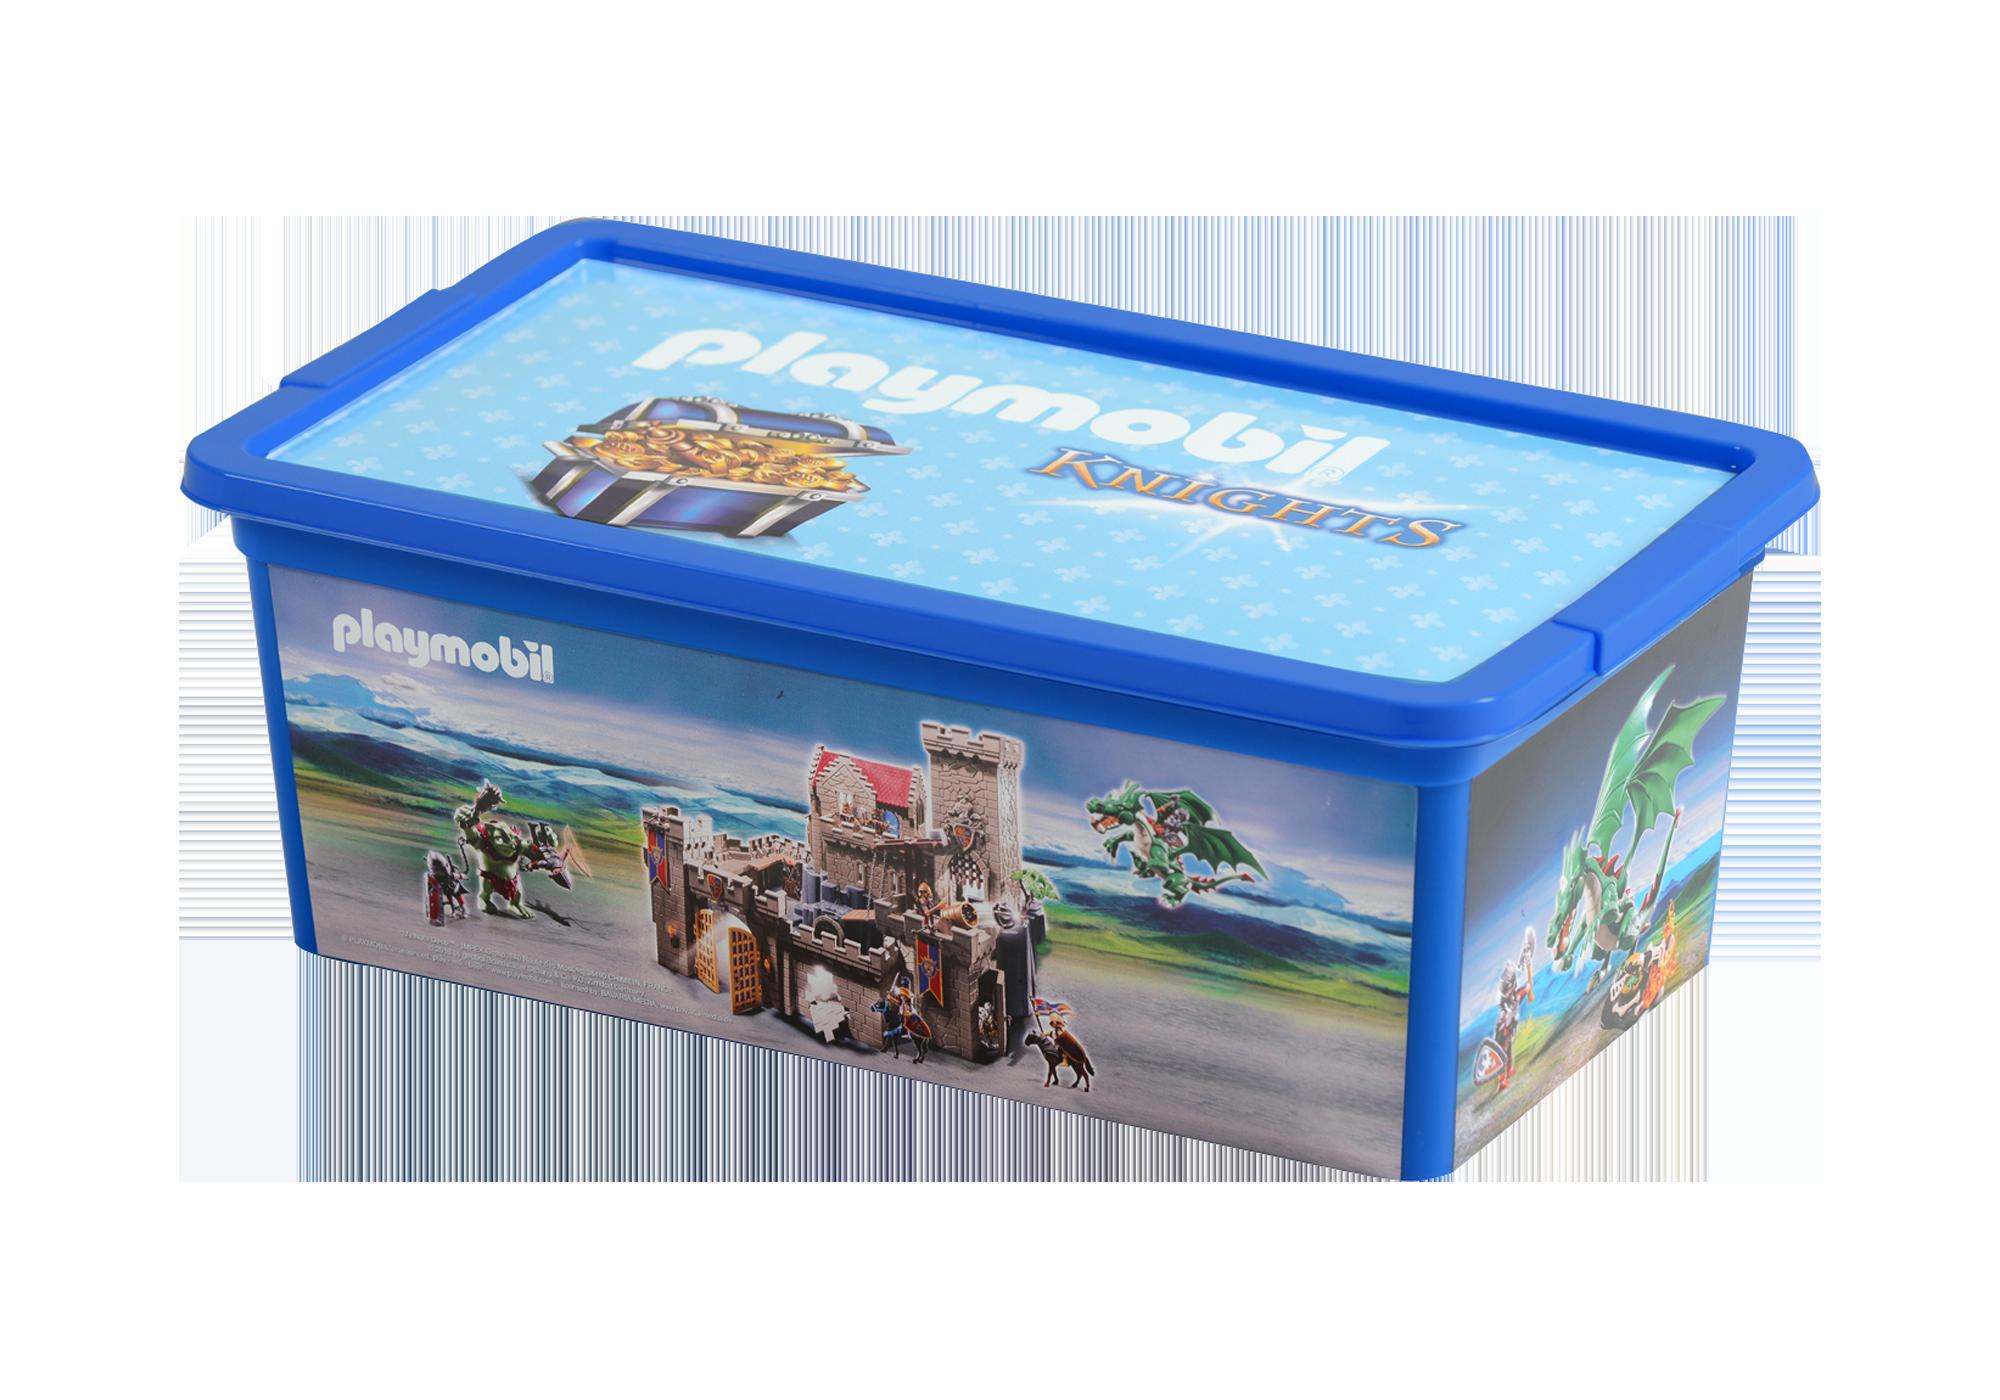 http://media.playmobil.com/i/playmobil/80489_product_detail/6L RITTER Aufbewahrungsbox